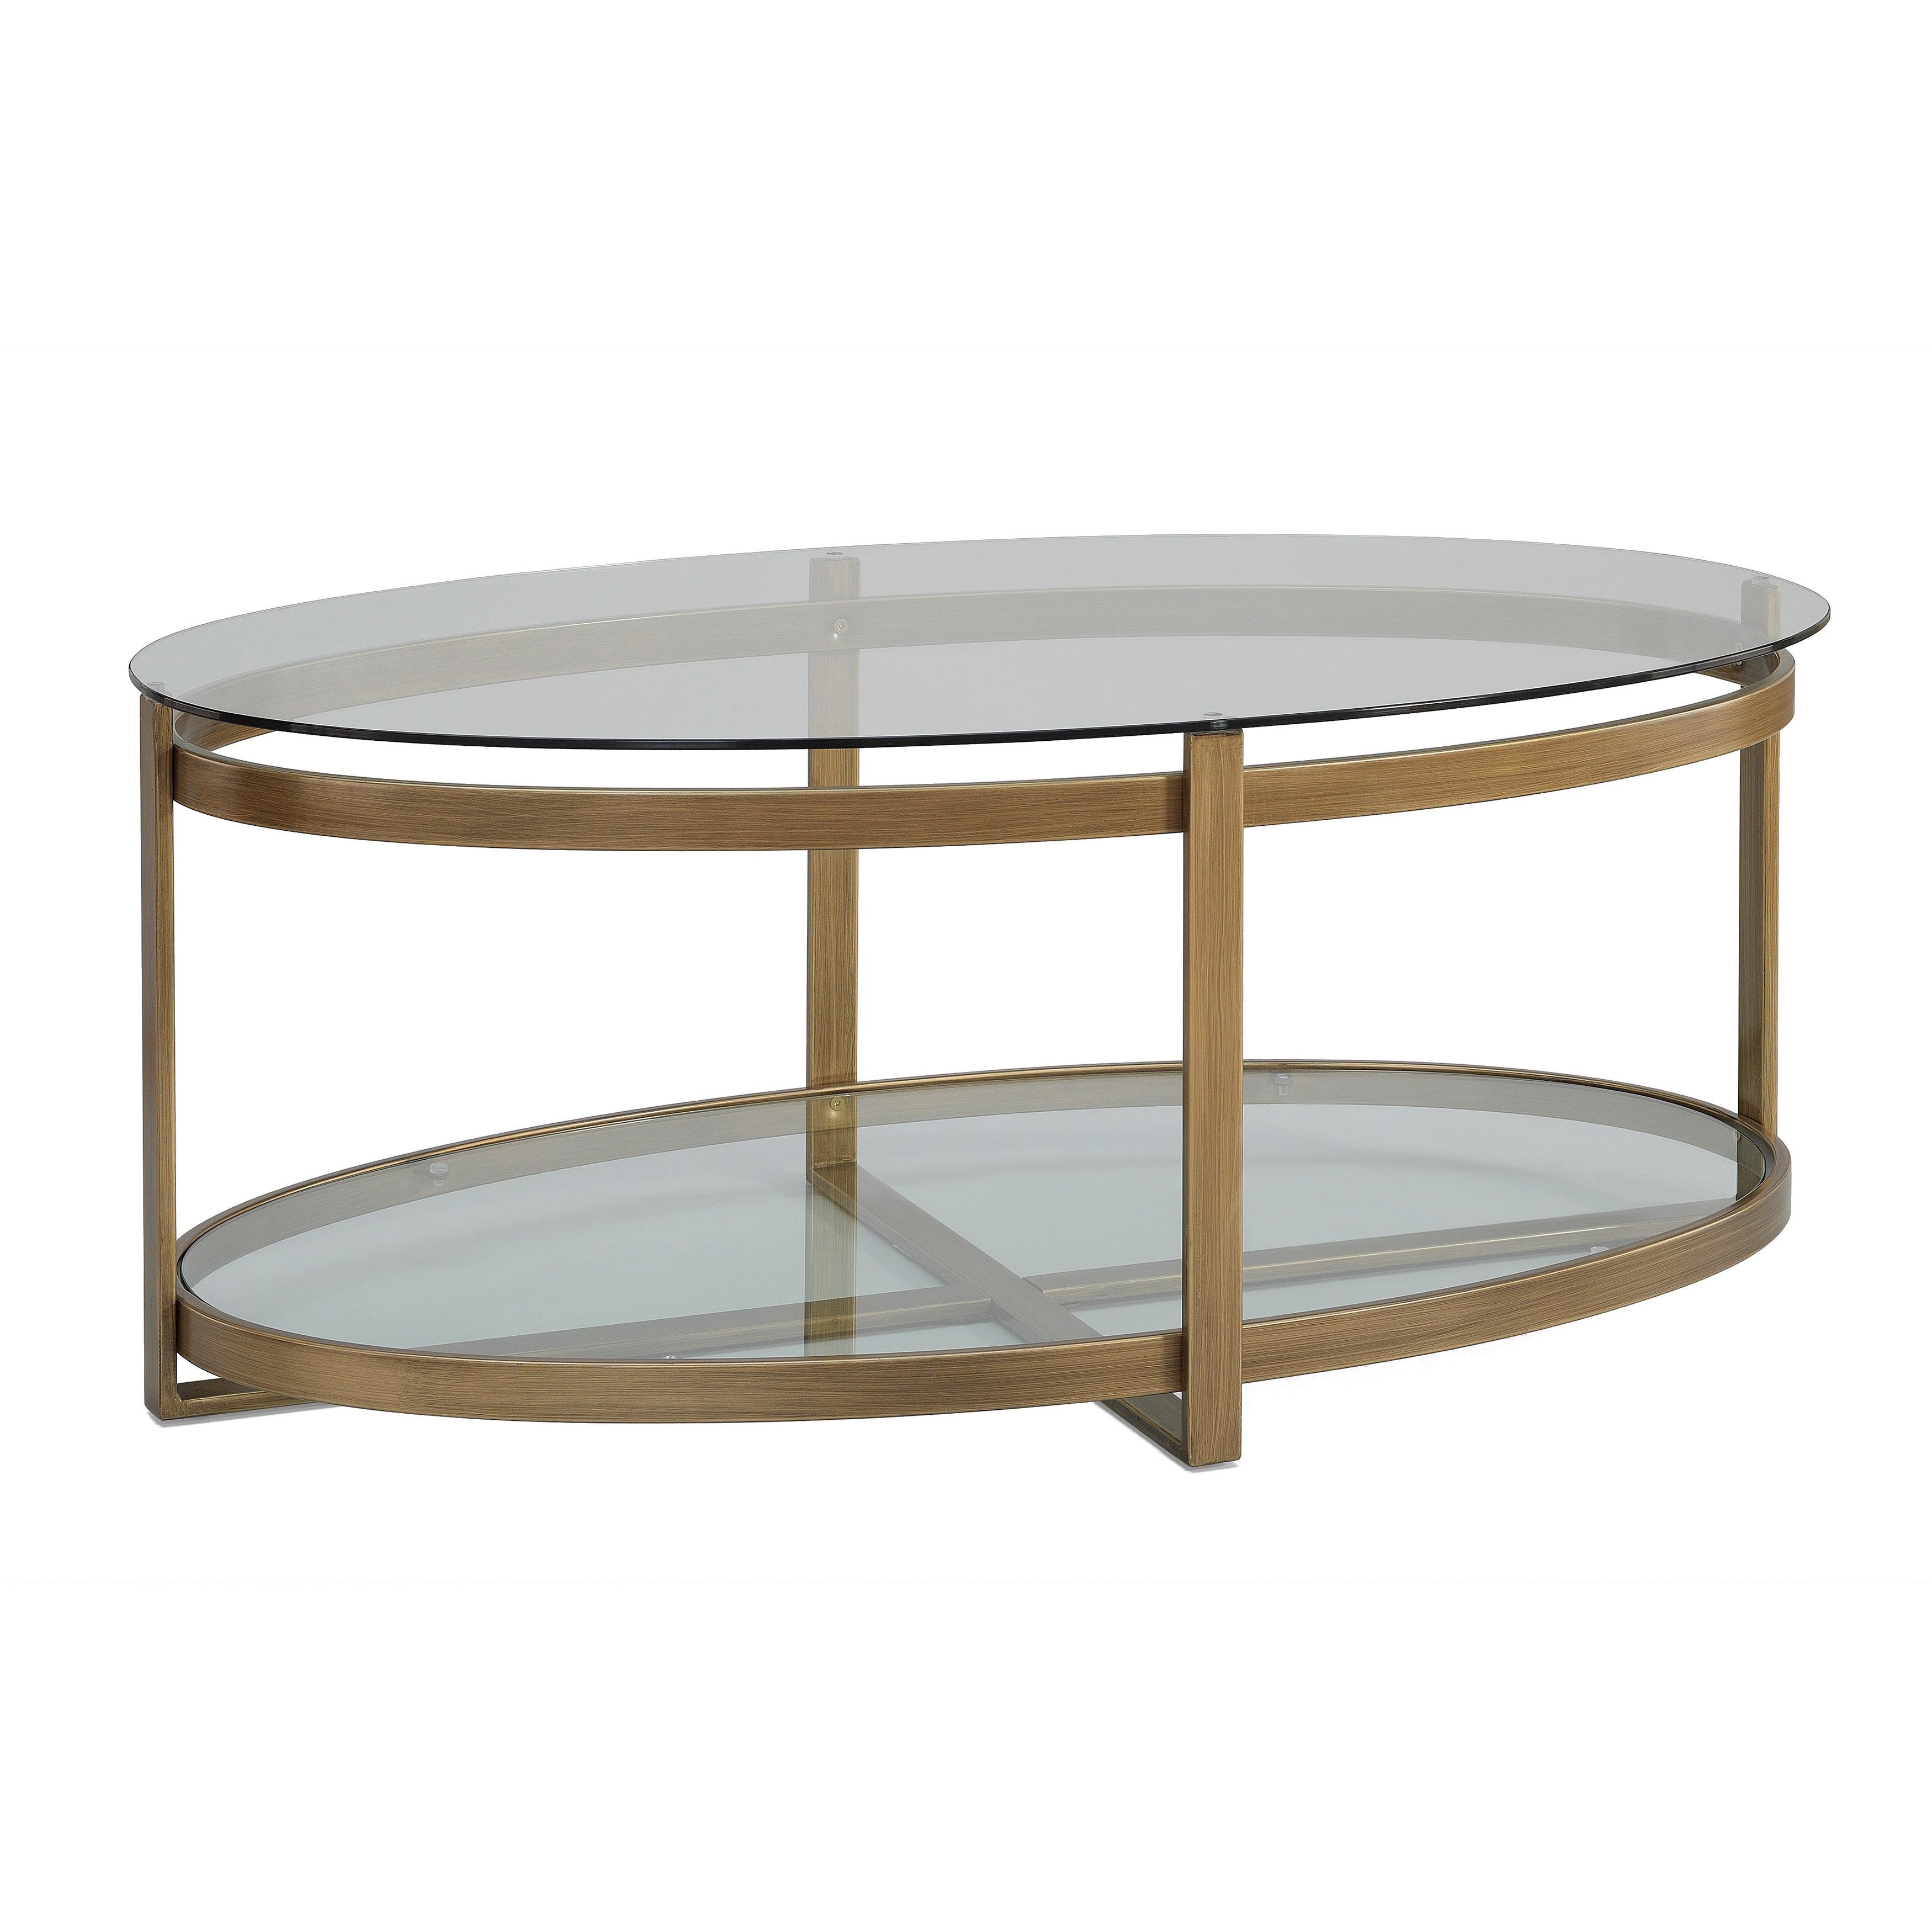 retro glitz glass metal coffee table  free shipping today  overstockcom . retro glitz glass metal coffee table  free shipping today